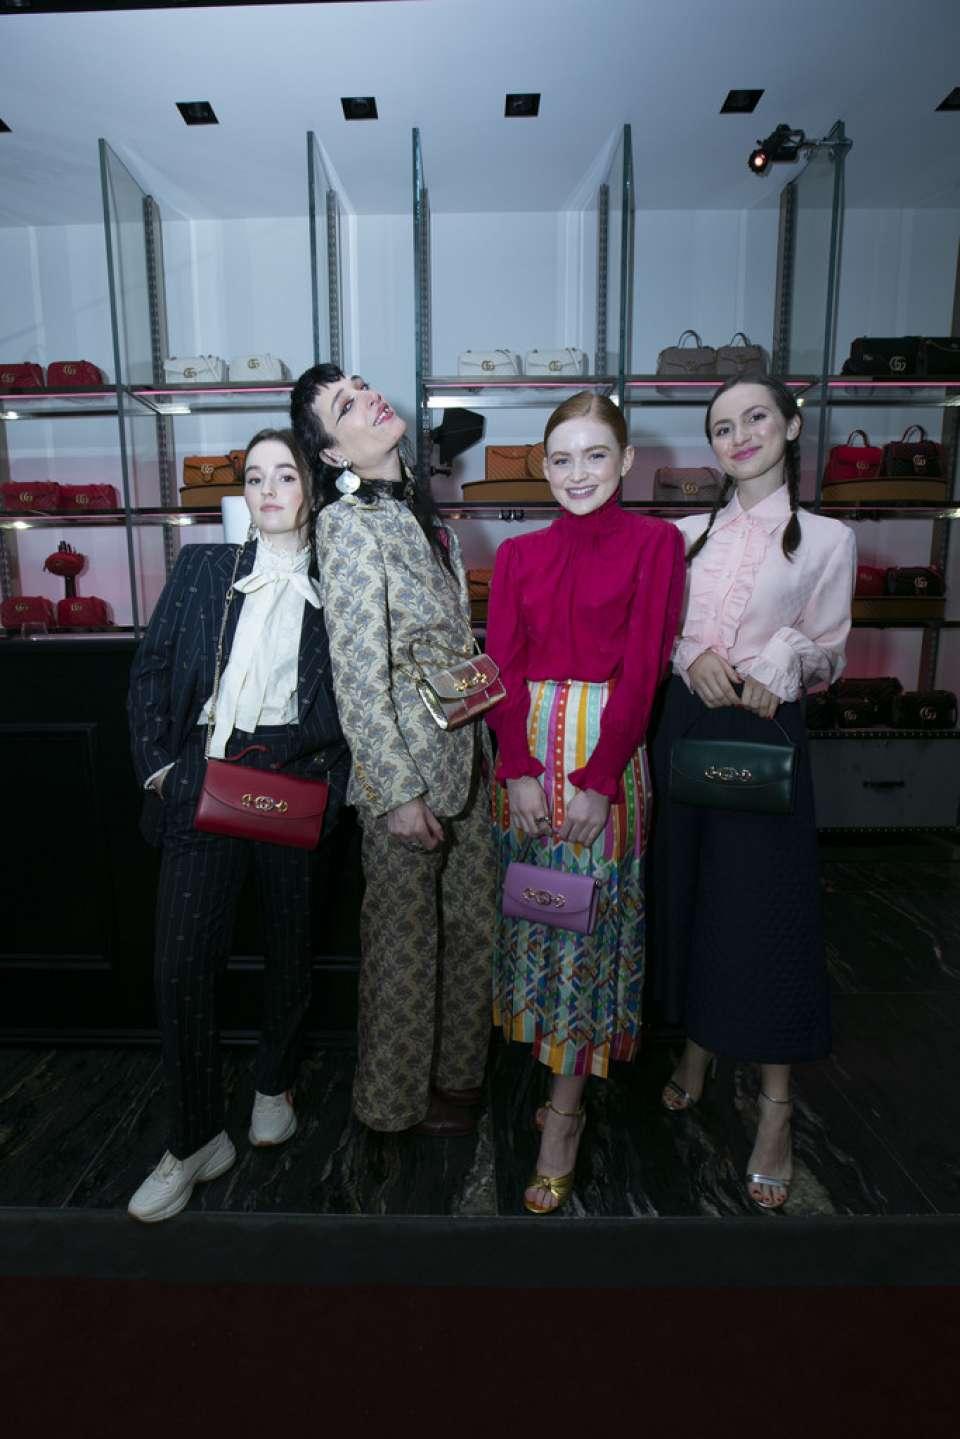 Sadie Sink 2019 : Sadie Sink – Gucci Zumi Handbag Collection-12